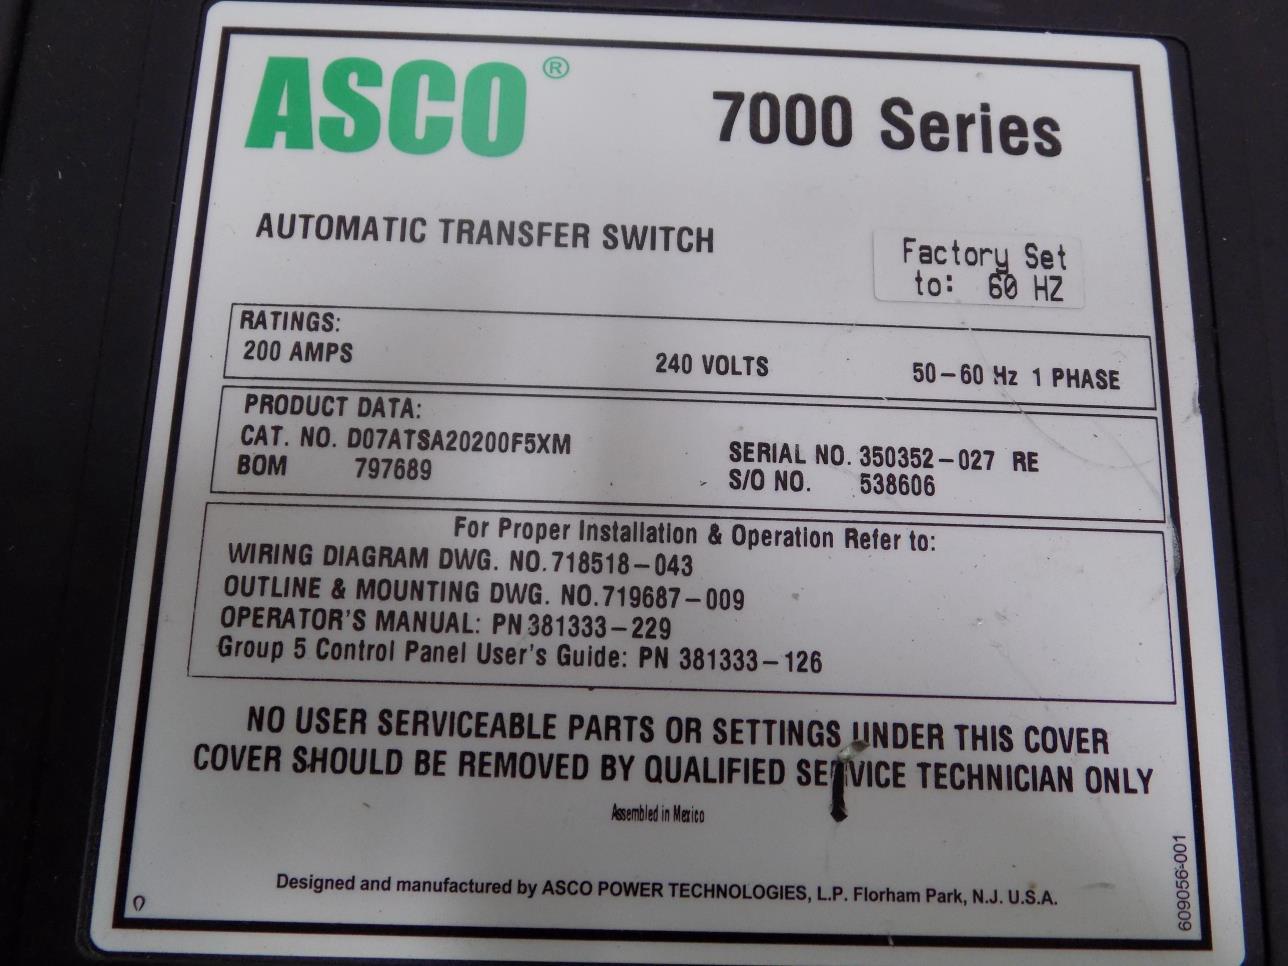 Asco 7000 Ser 200a 240v 1ph 50 60hz Automatic Transfer Switch Wiring Diagrams Further D07atsa20200f5xm